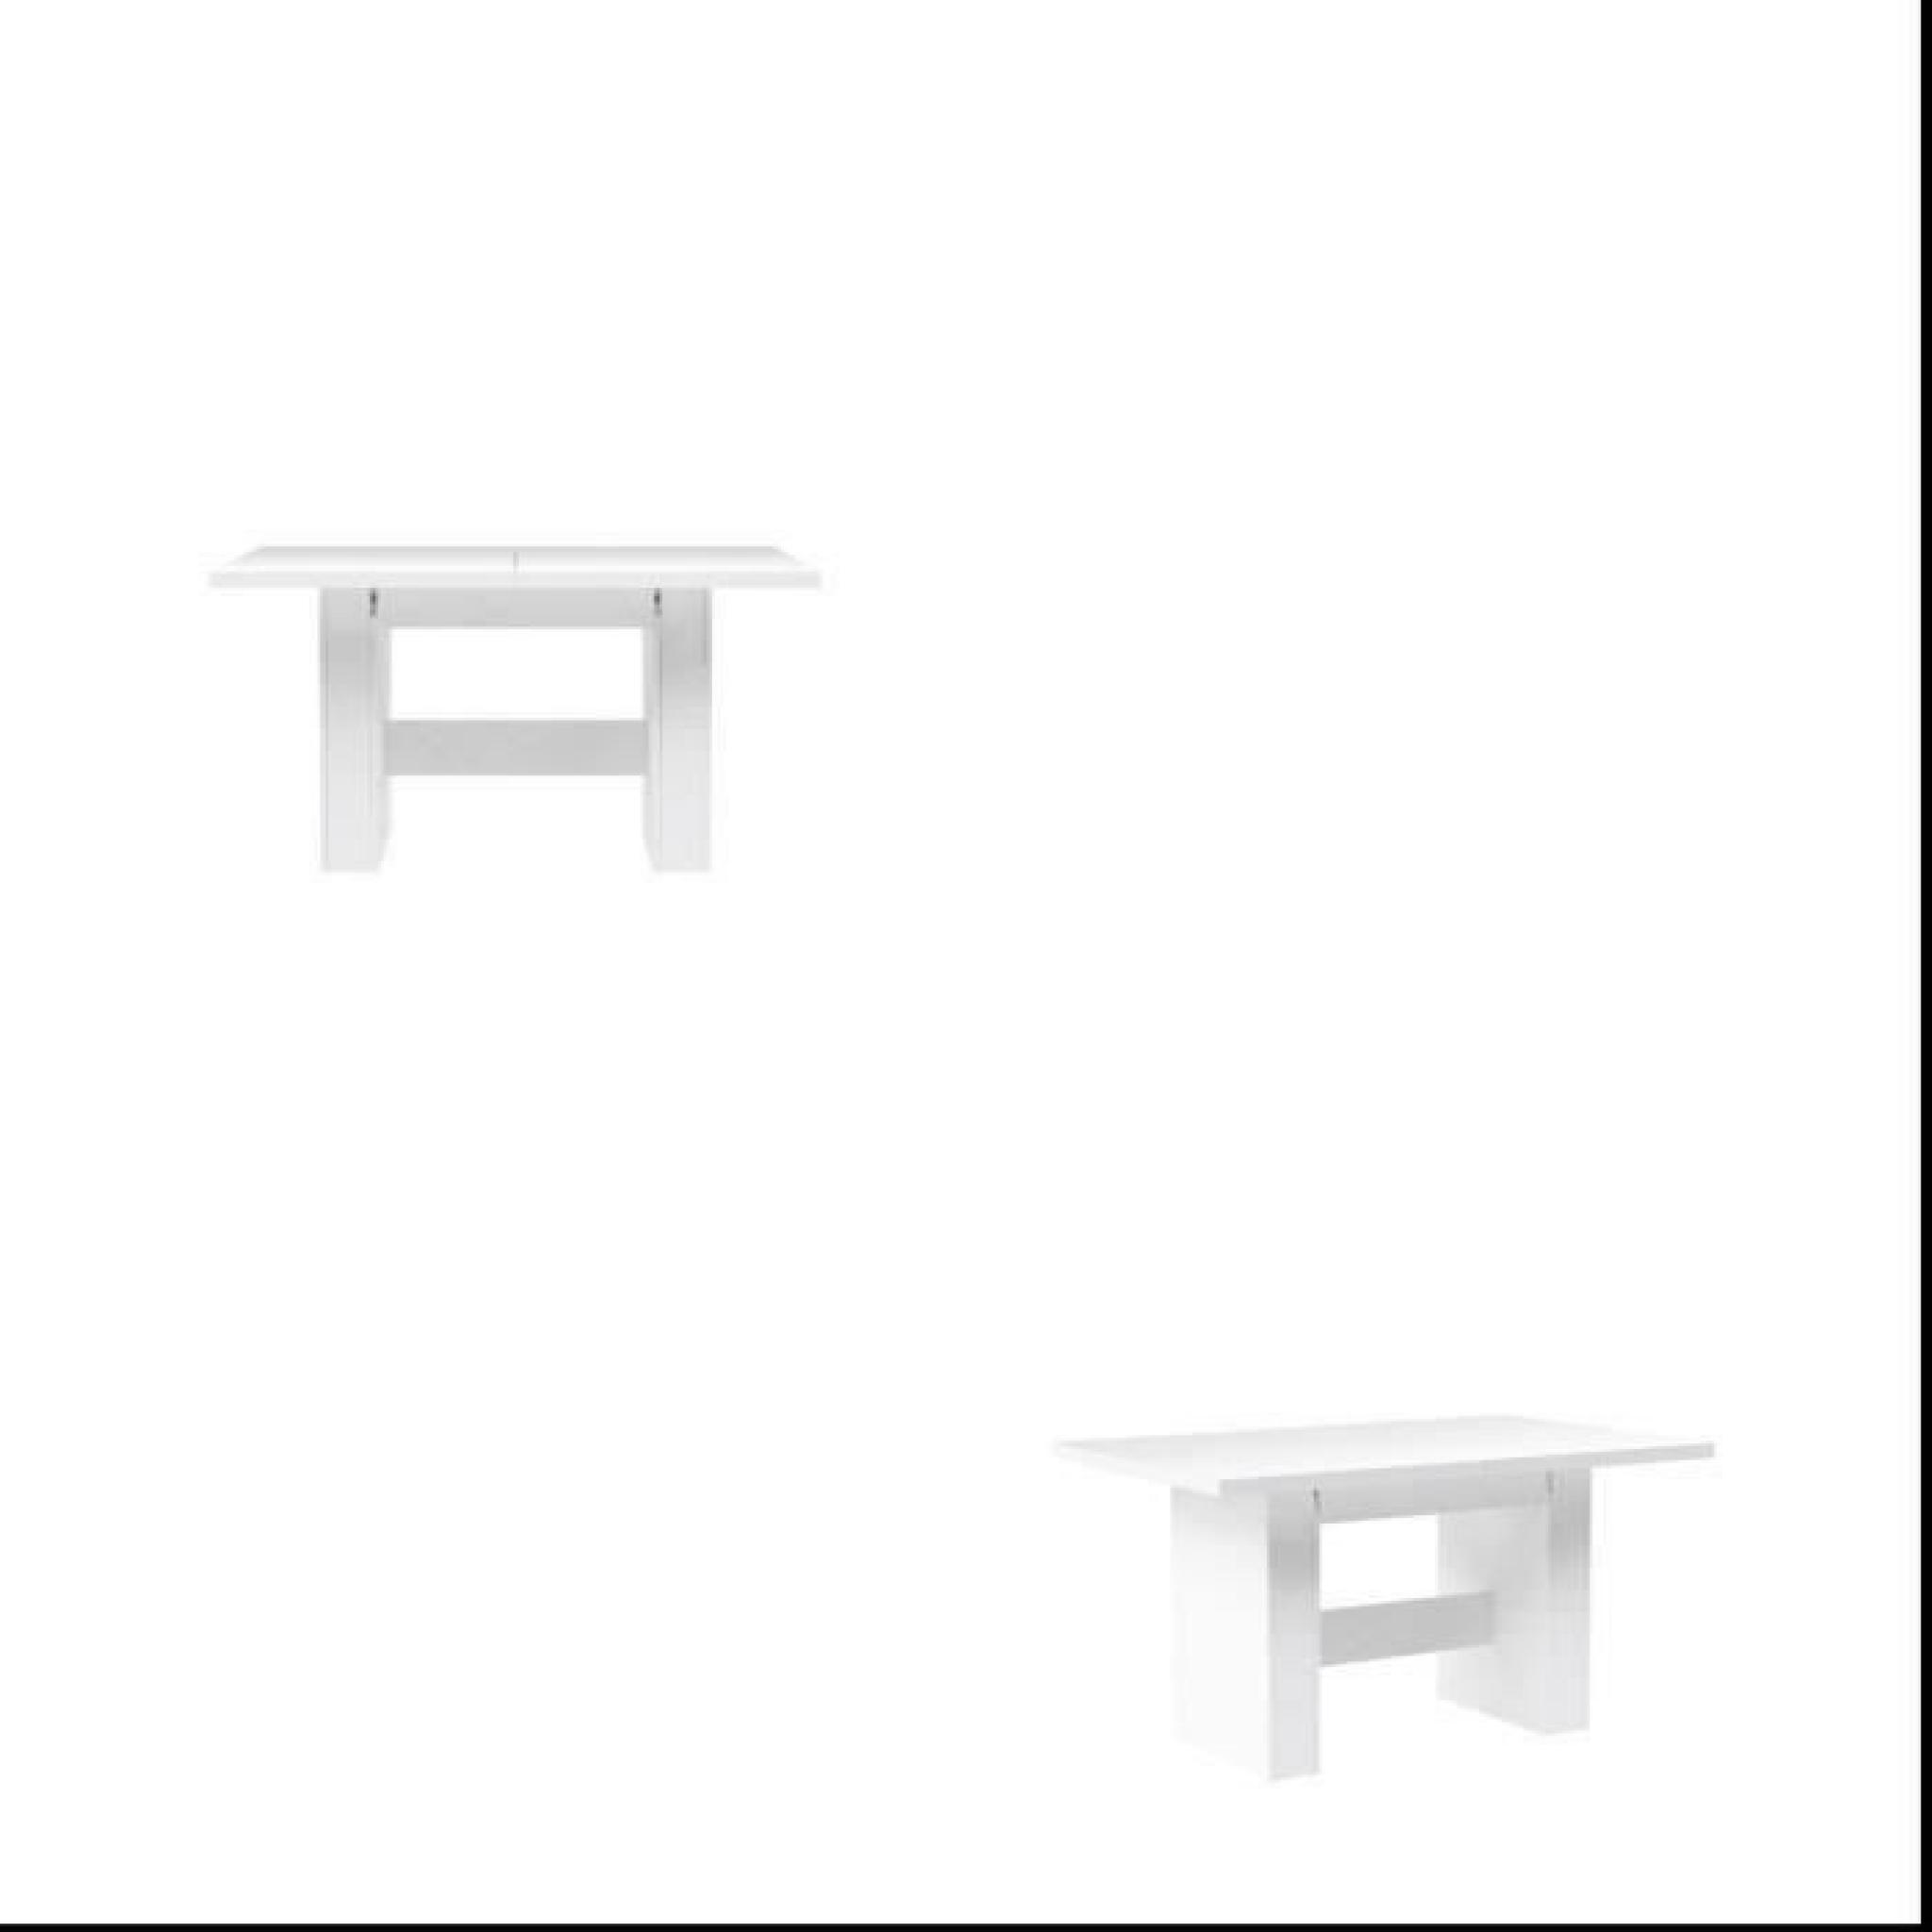 Finlandek Table à Manger Extensible Kova 140 273x75cm Blanc Brillant